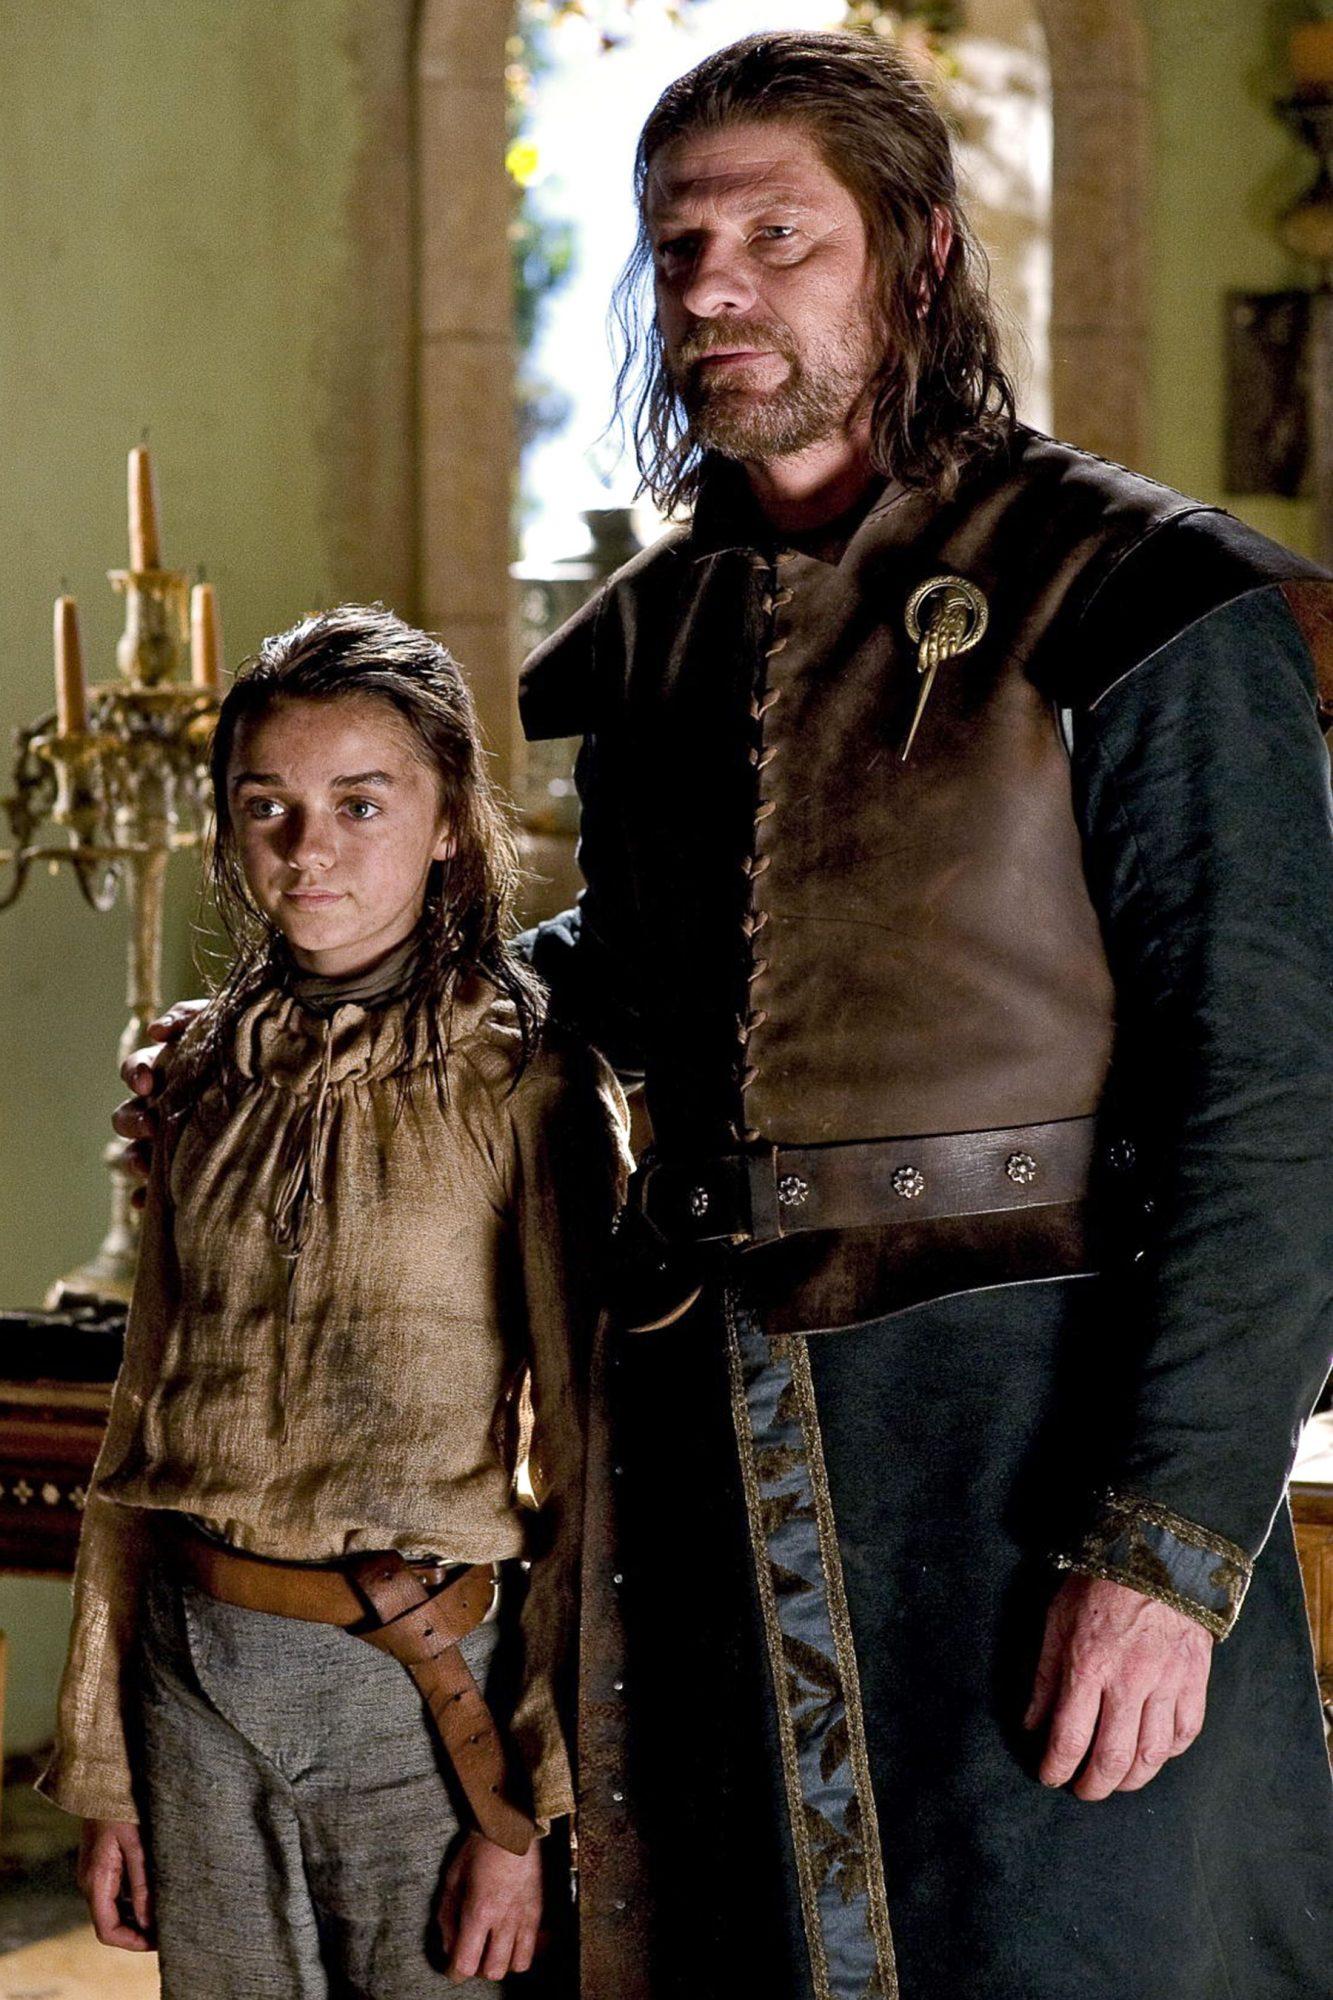 Game of Thrones (2011)Season 1, Episode 5Maisie Williams and Sean Bean